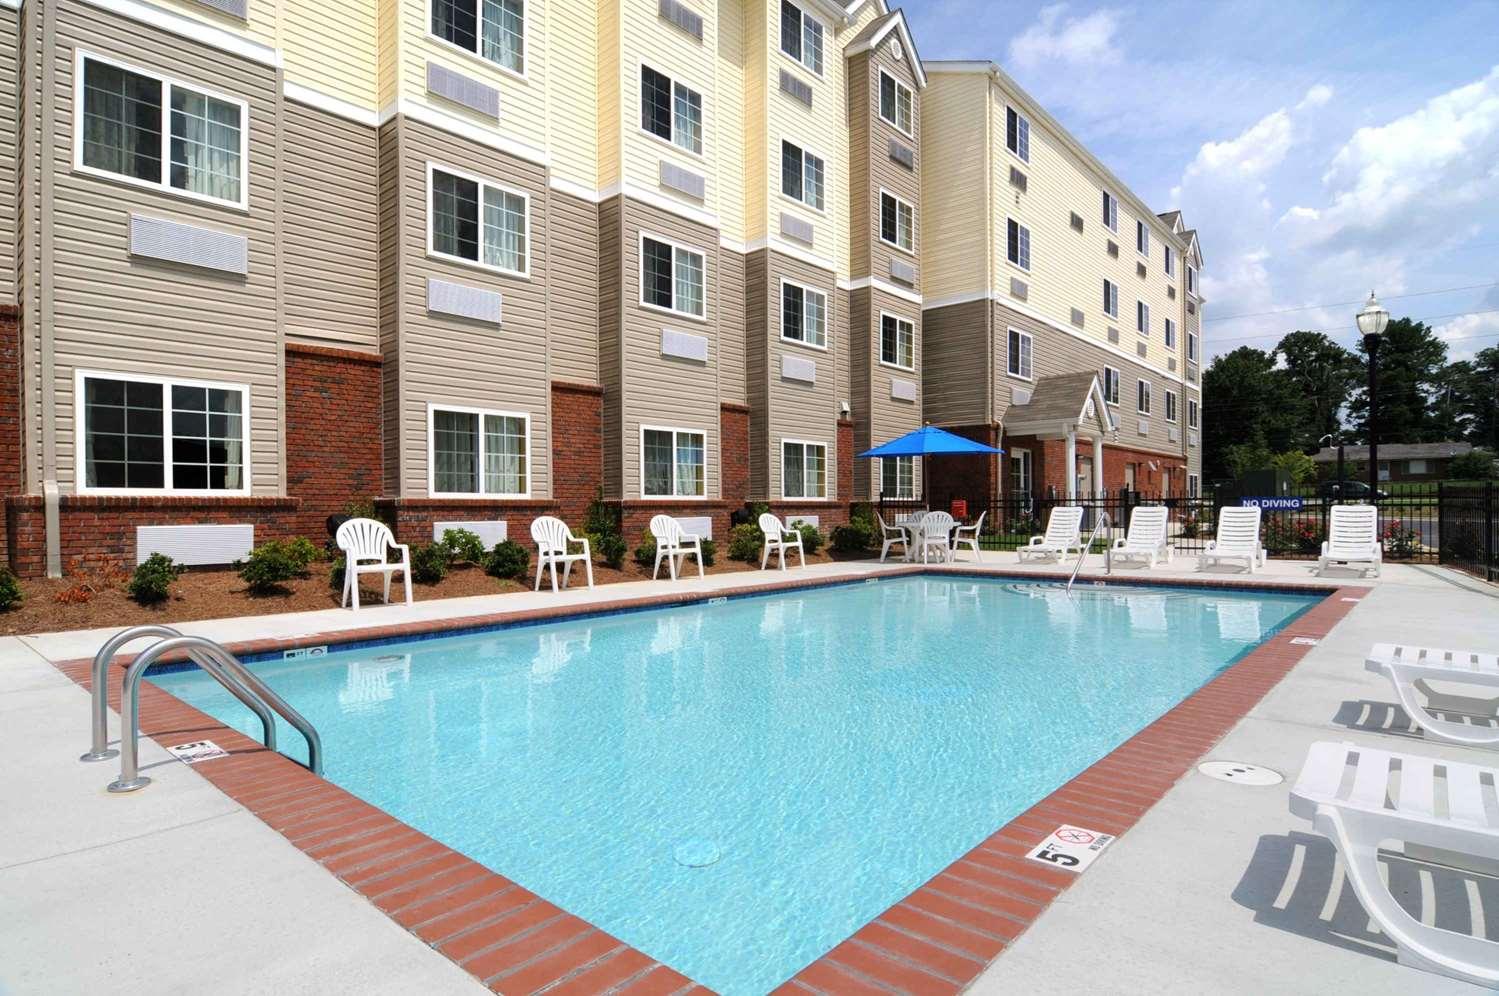 Pool - Microtel Inn & Suites by Wyndham Fort Benning Columbus